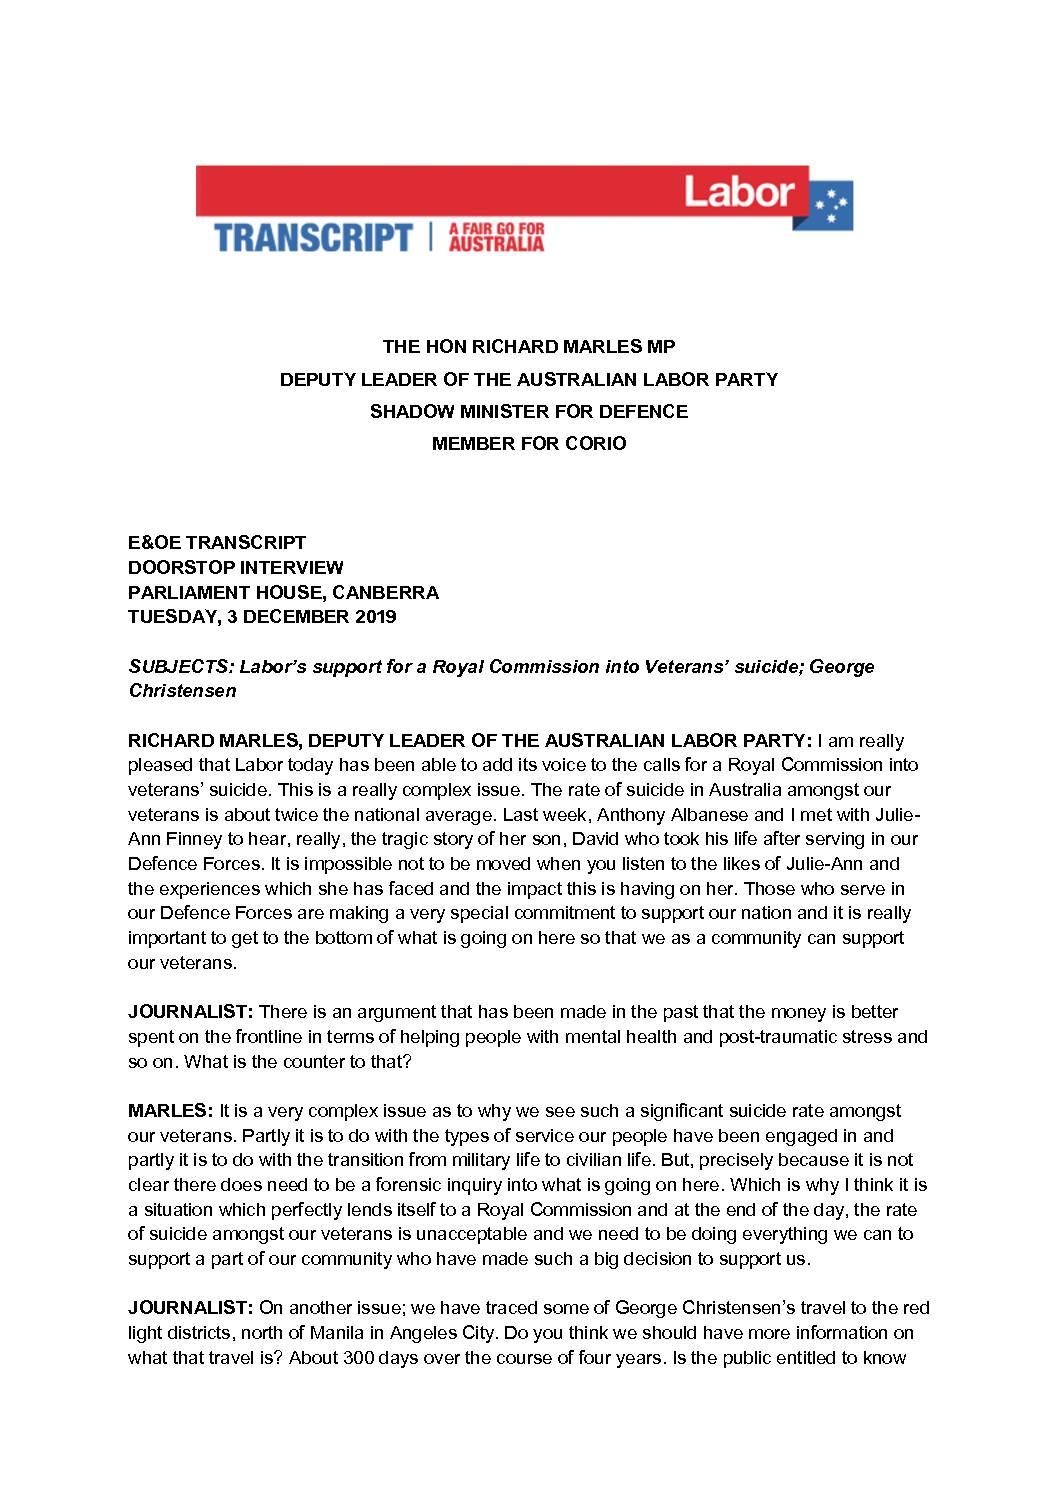 19.12.03 DOORSTOP INTERVIEW PARLIAMENT HOUSE CANBERRA – TRANSCRIPT